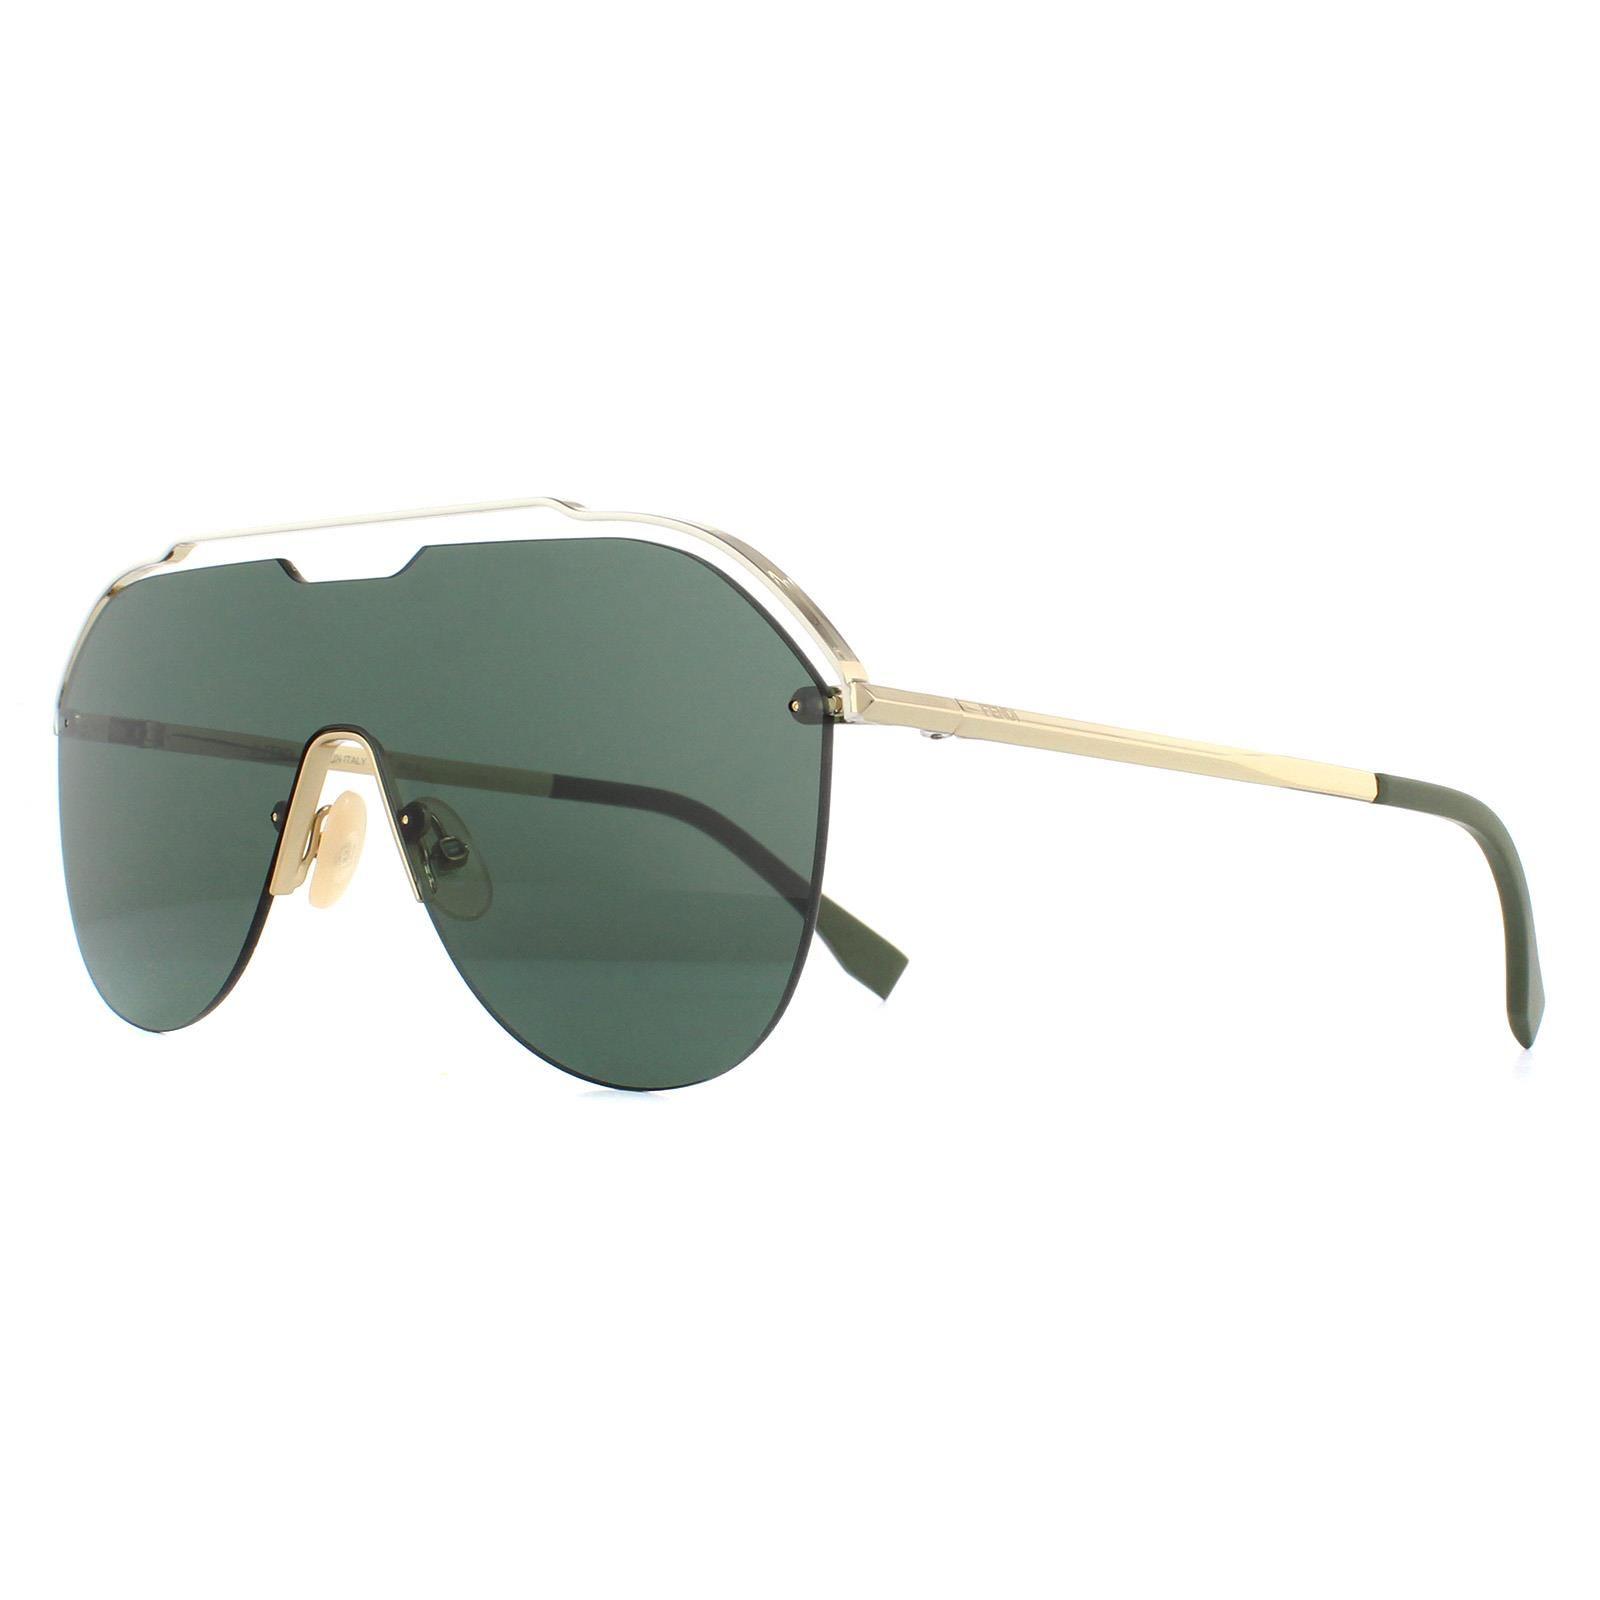 Fendi Sunglasses M0030/S J5G QT Gold Green